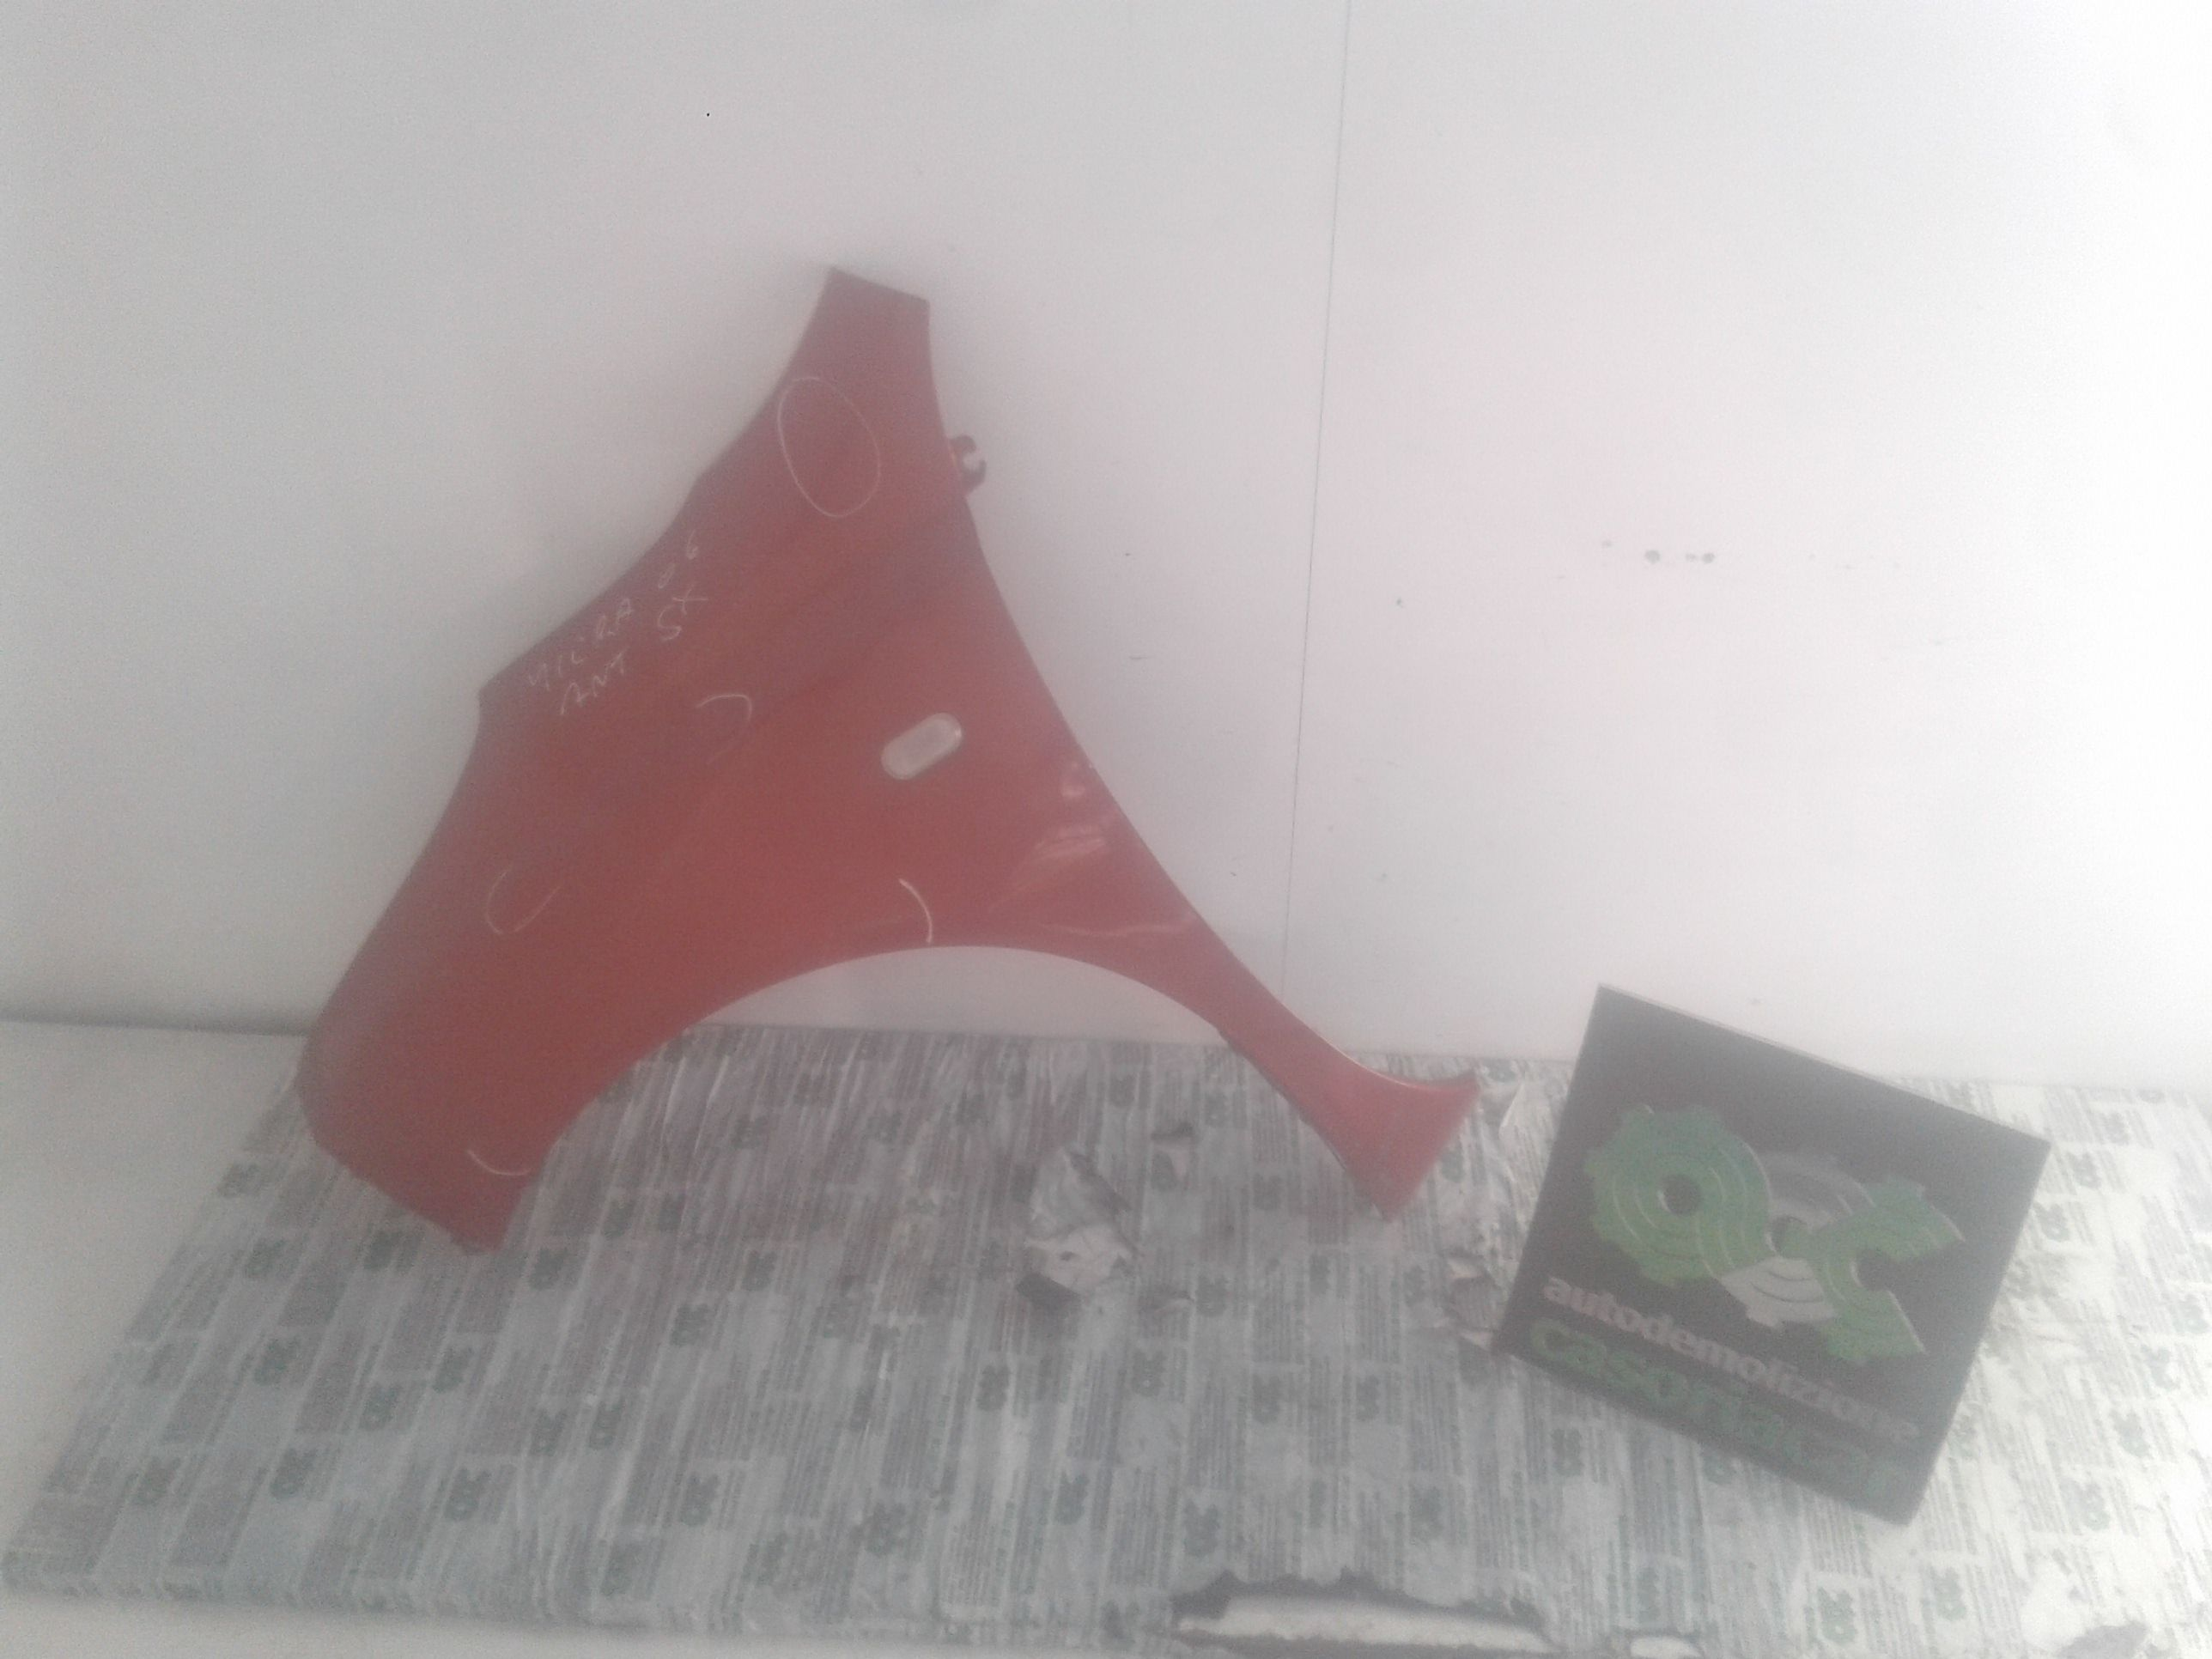 PARAFANGO ANTERIORE SINISTRO NISSAN Micra Cabrio Benzina  (2006) RICAMBI USATI